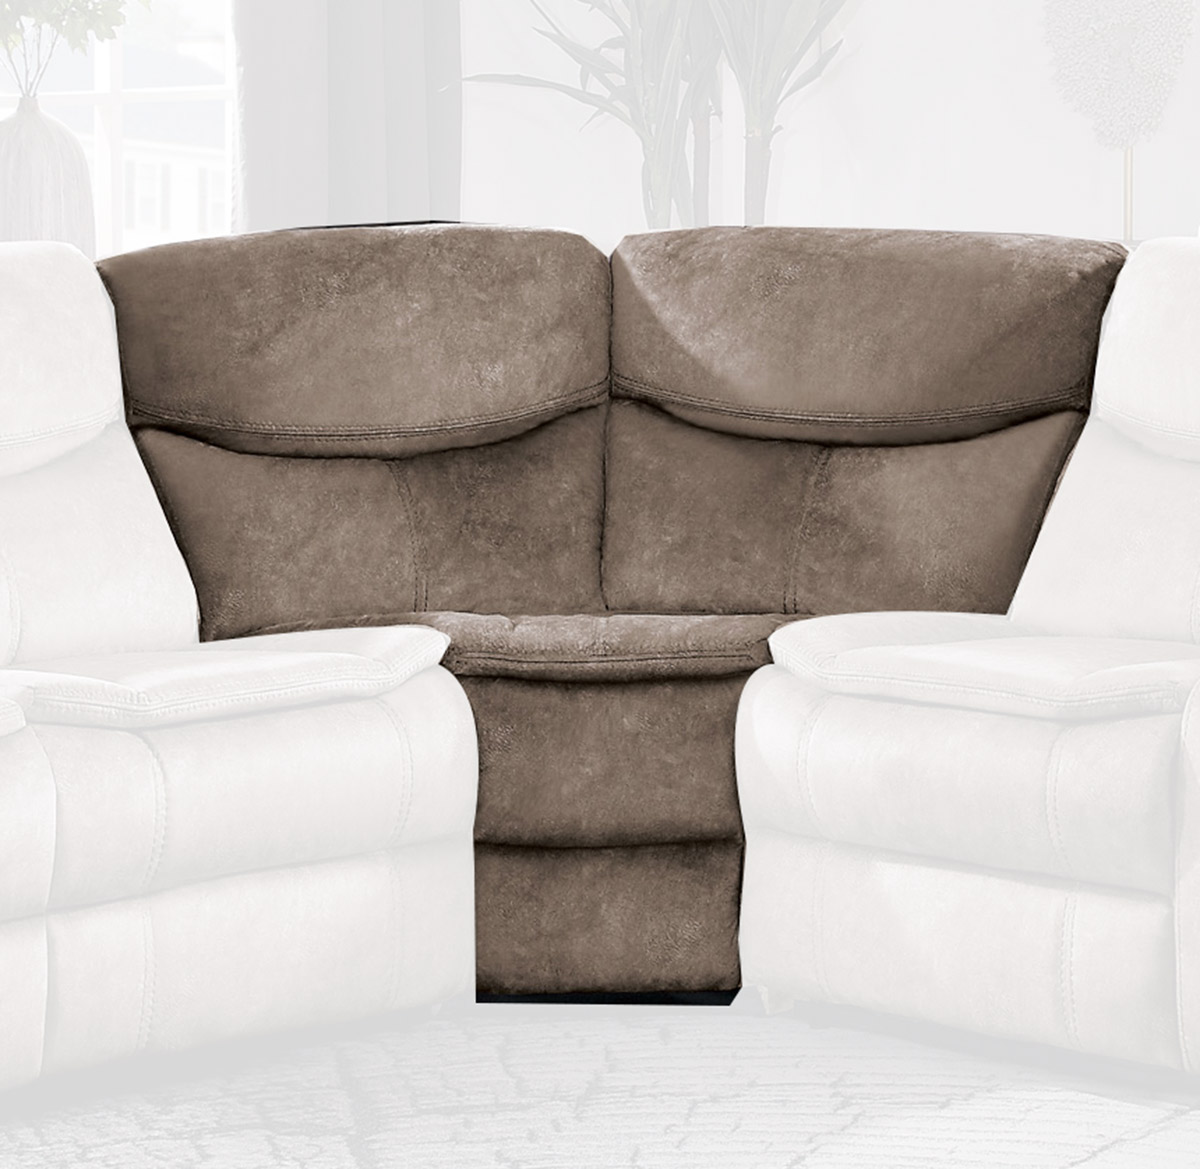 Homelegance Bastrop Corner Seat - Brown